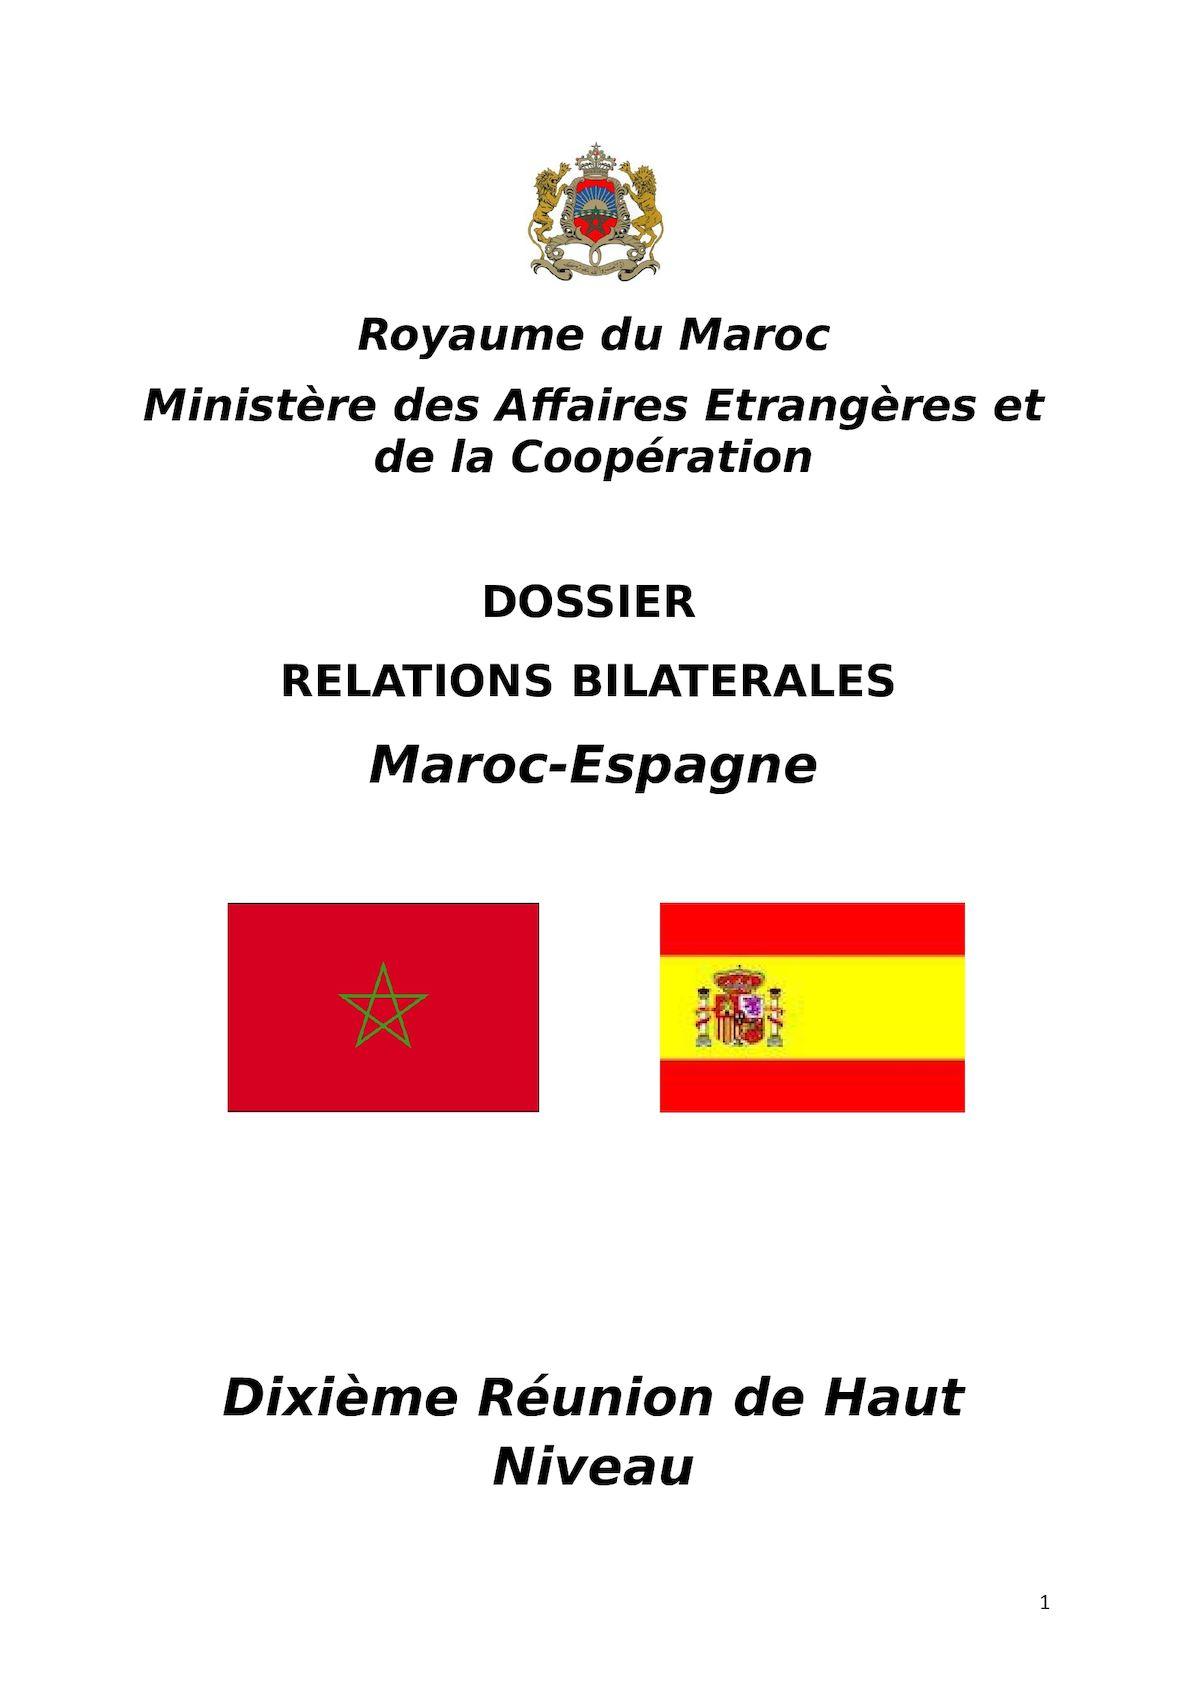 DOSSIER Relations  Bilaterales  MAROC ESPAGNE